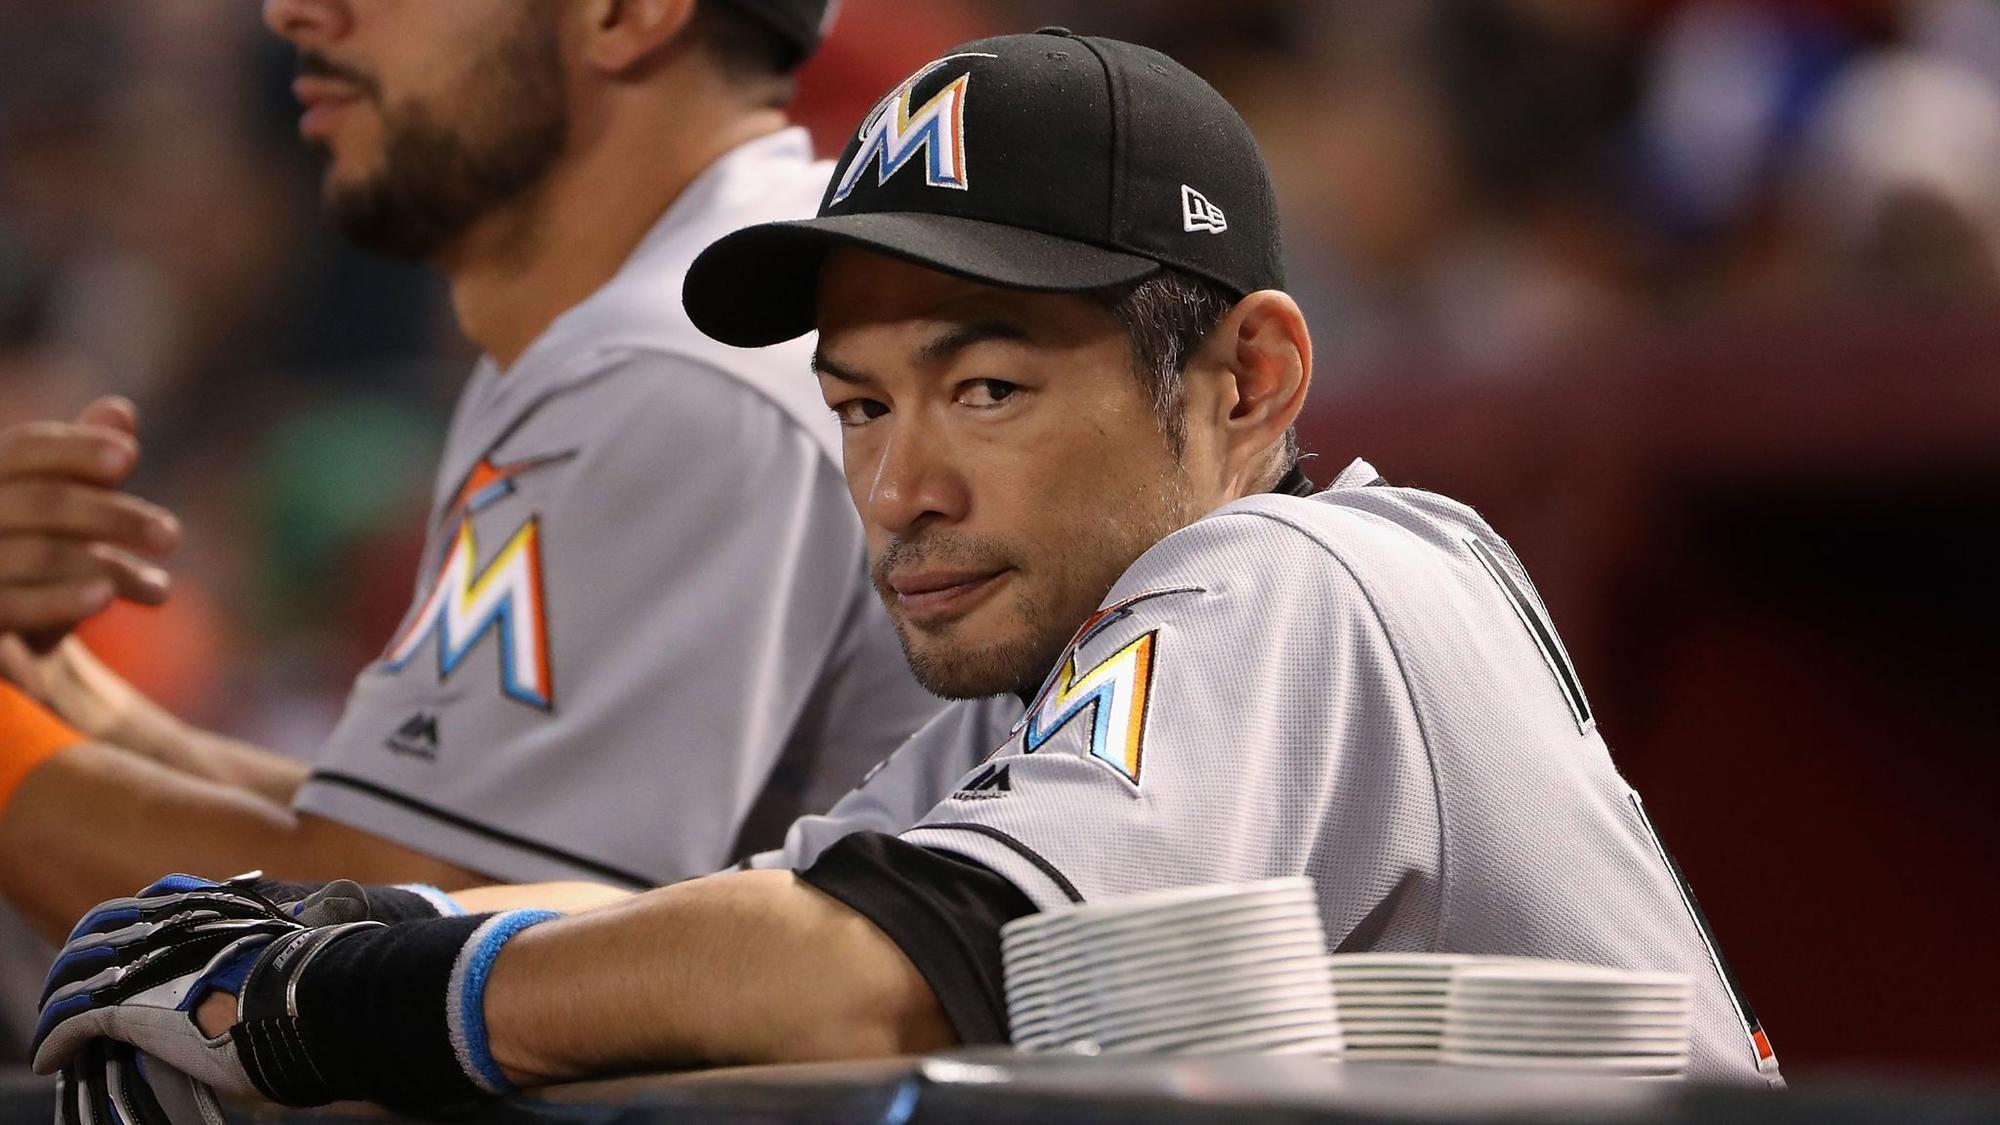 Ichiro Suzuki hopes to remain in Major League Baseball